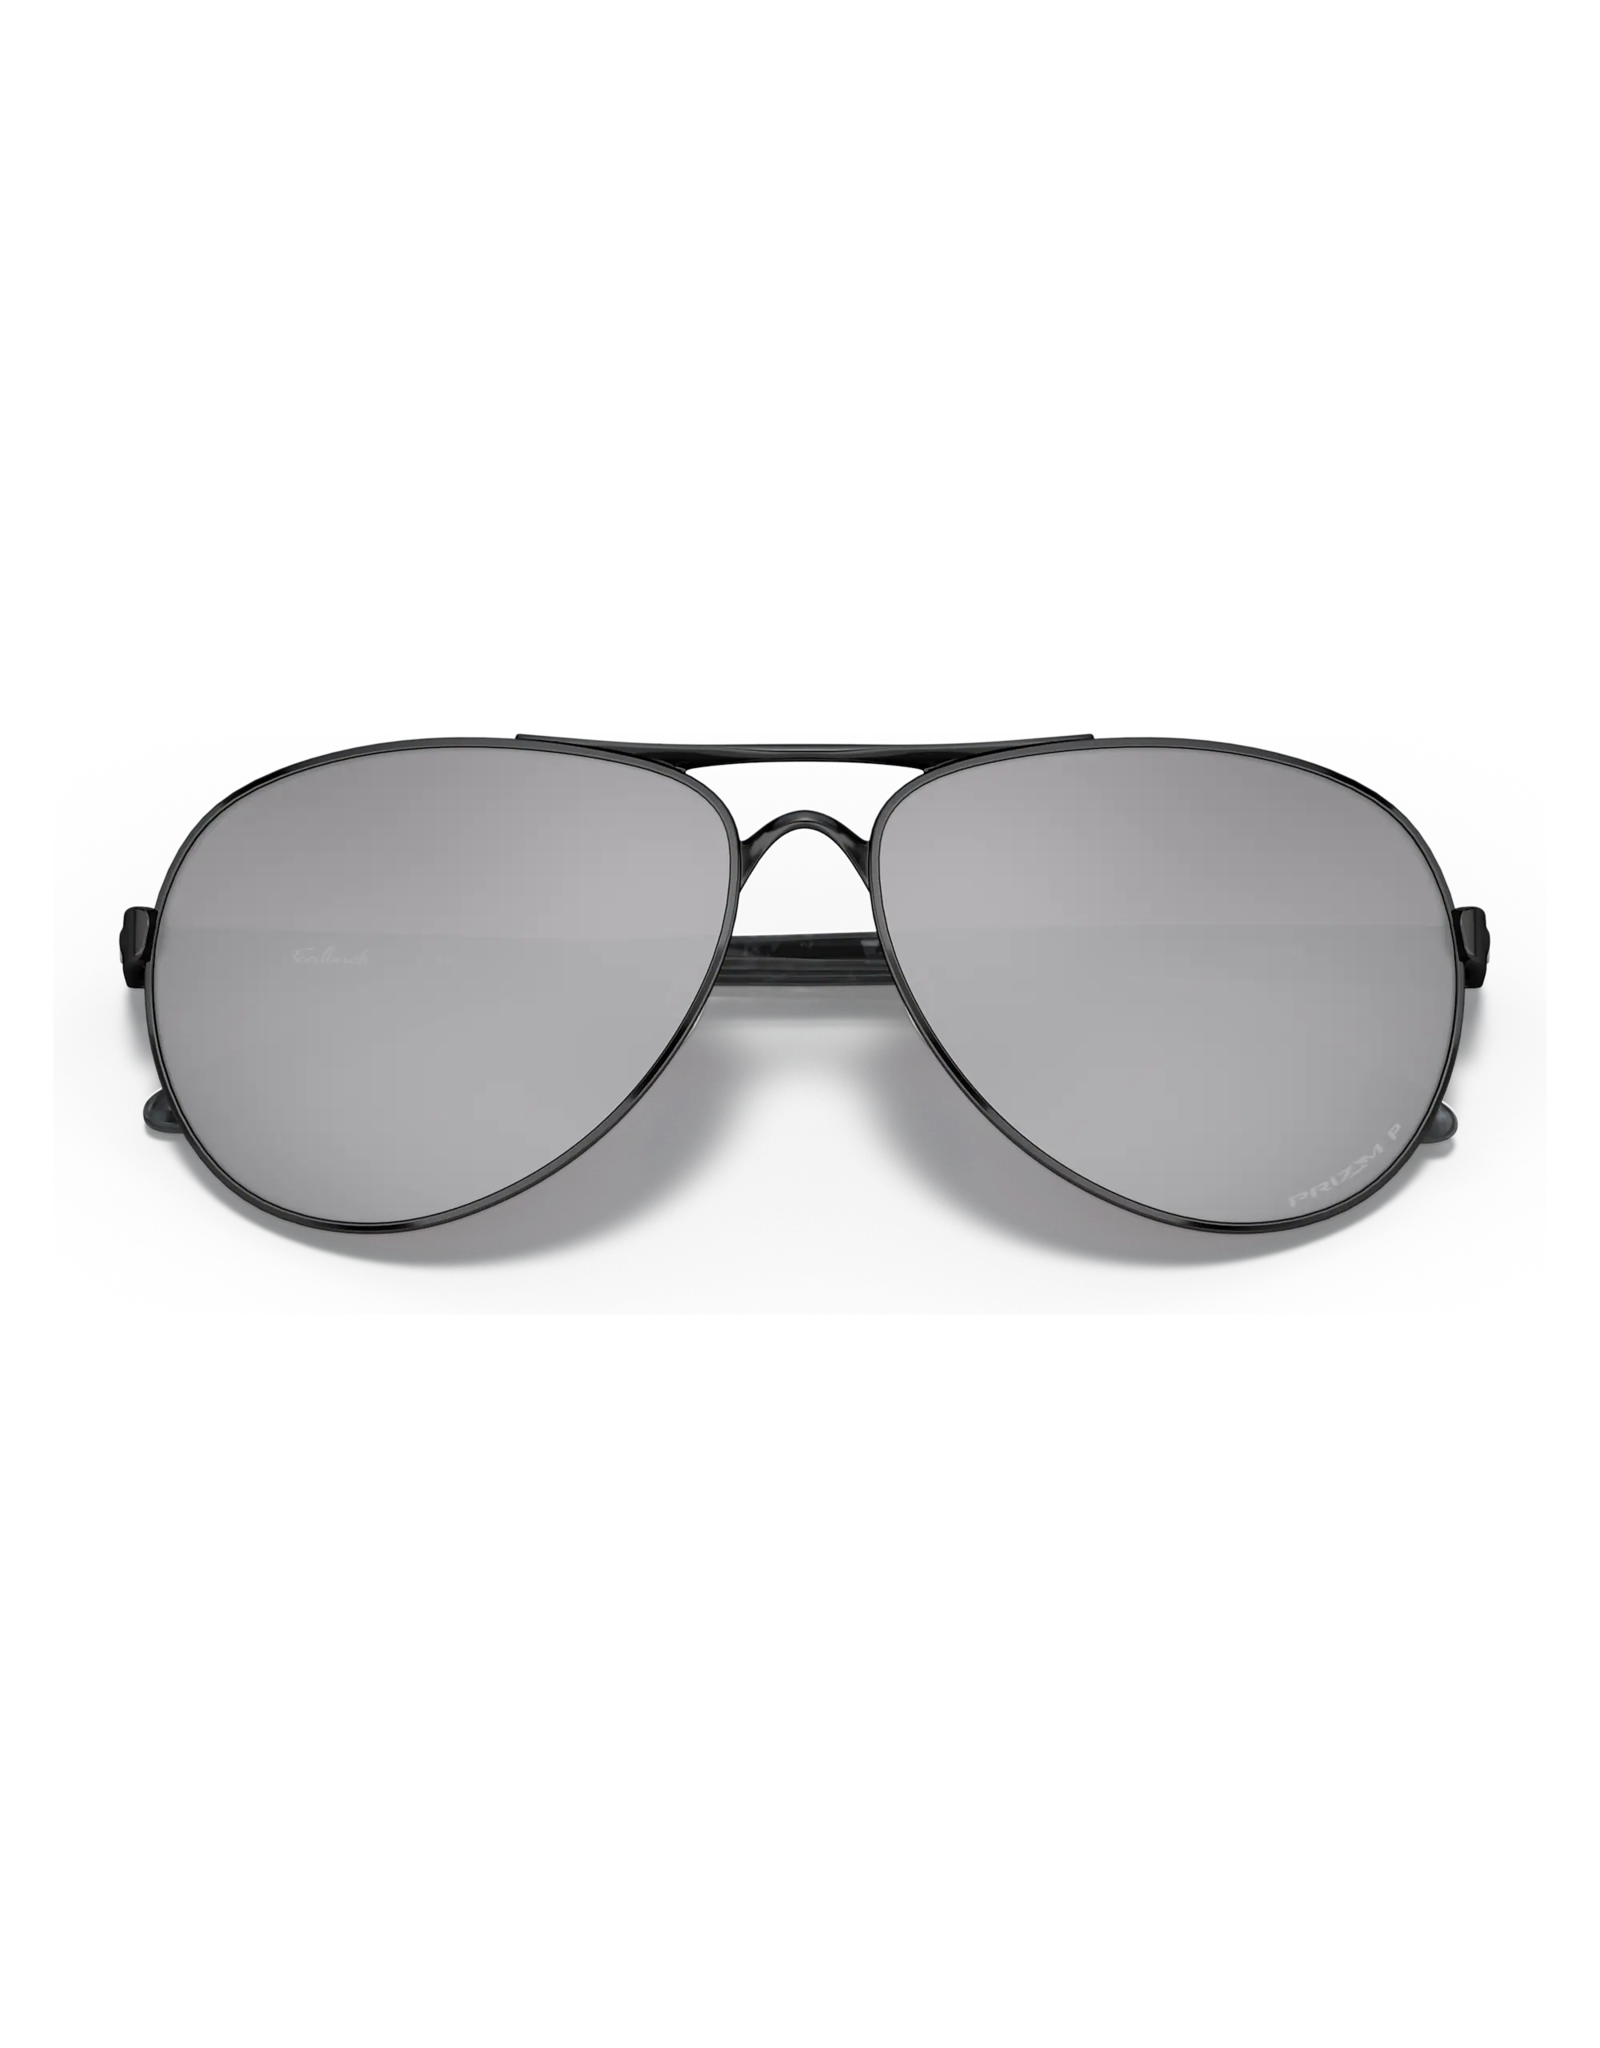 OAKLEY Oakley Feedback polished black prizm polarized sunglasses